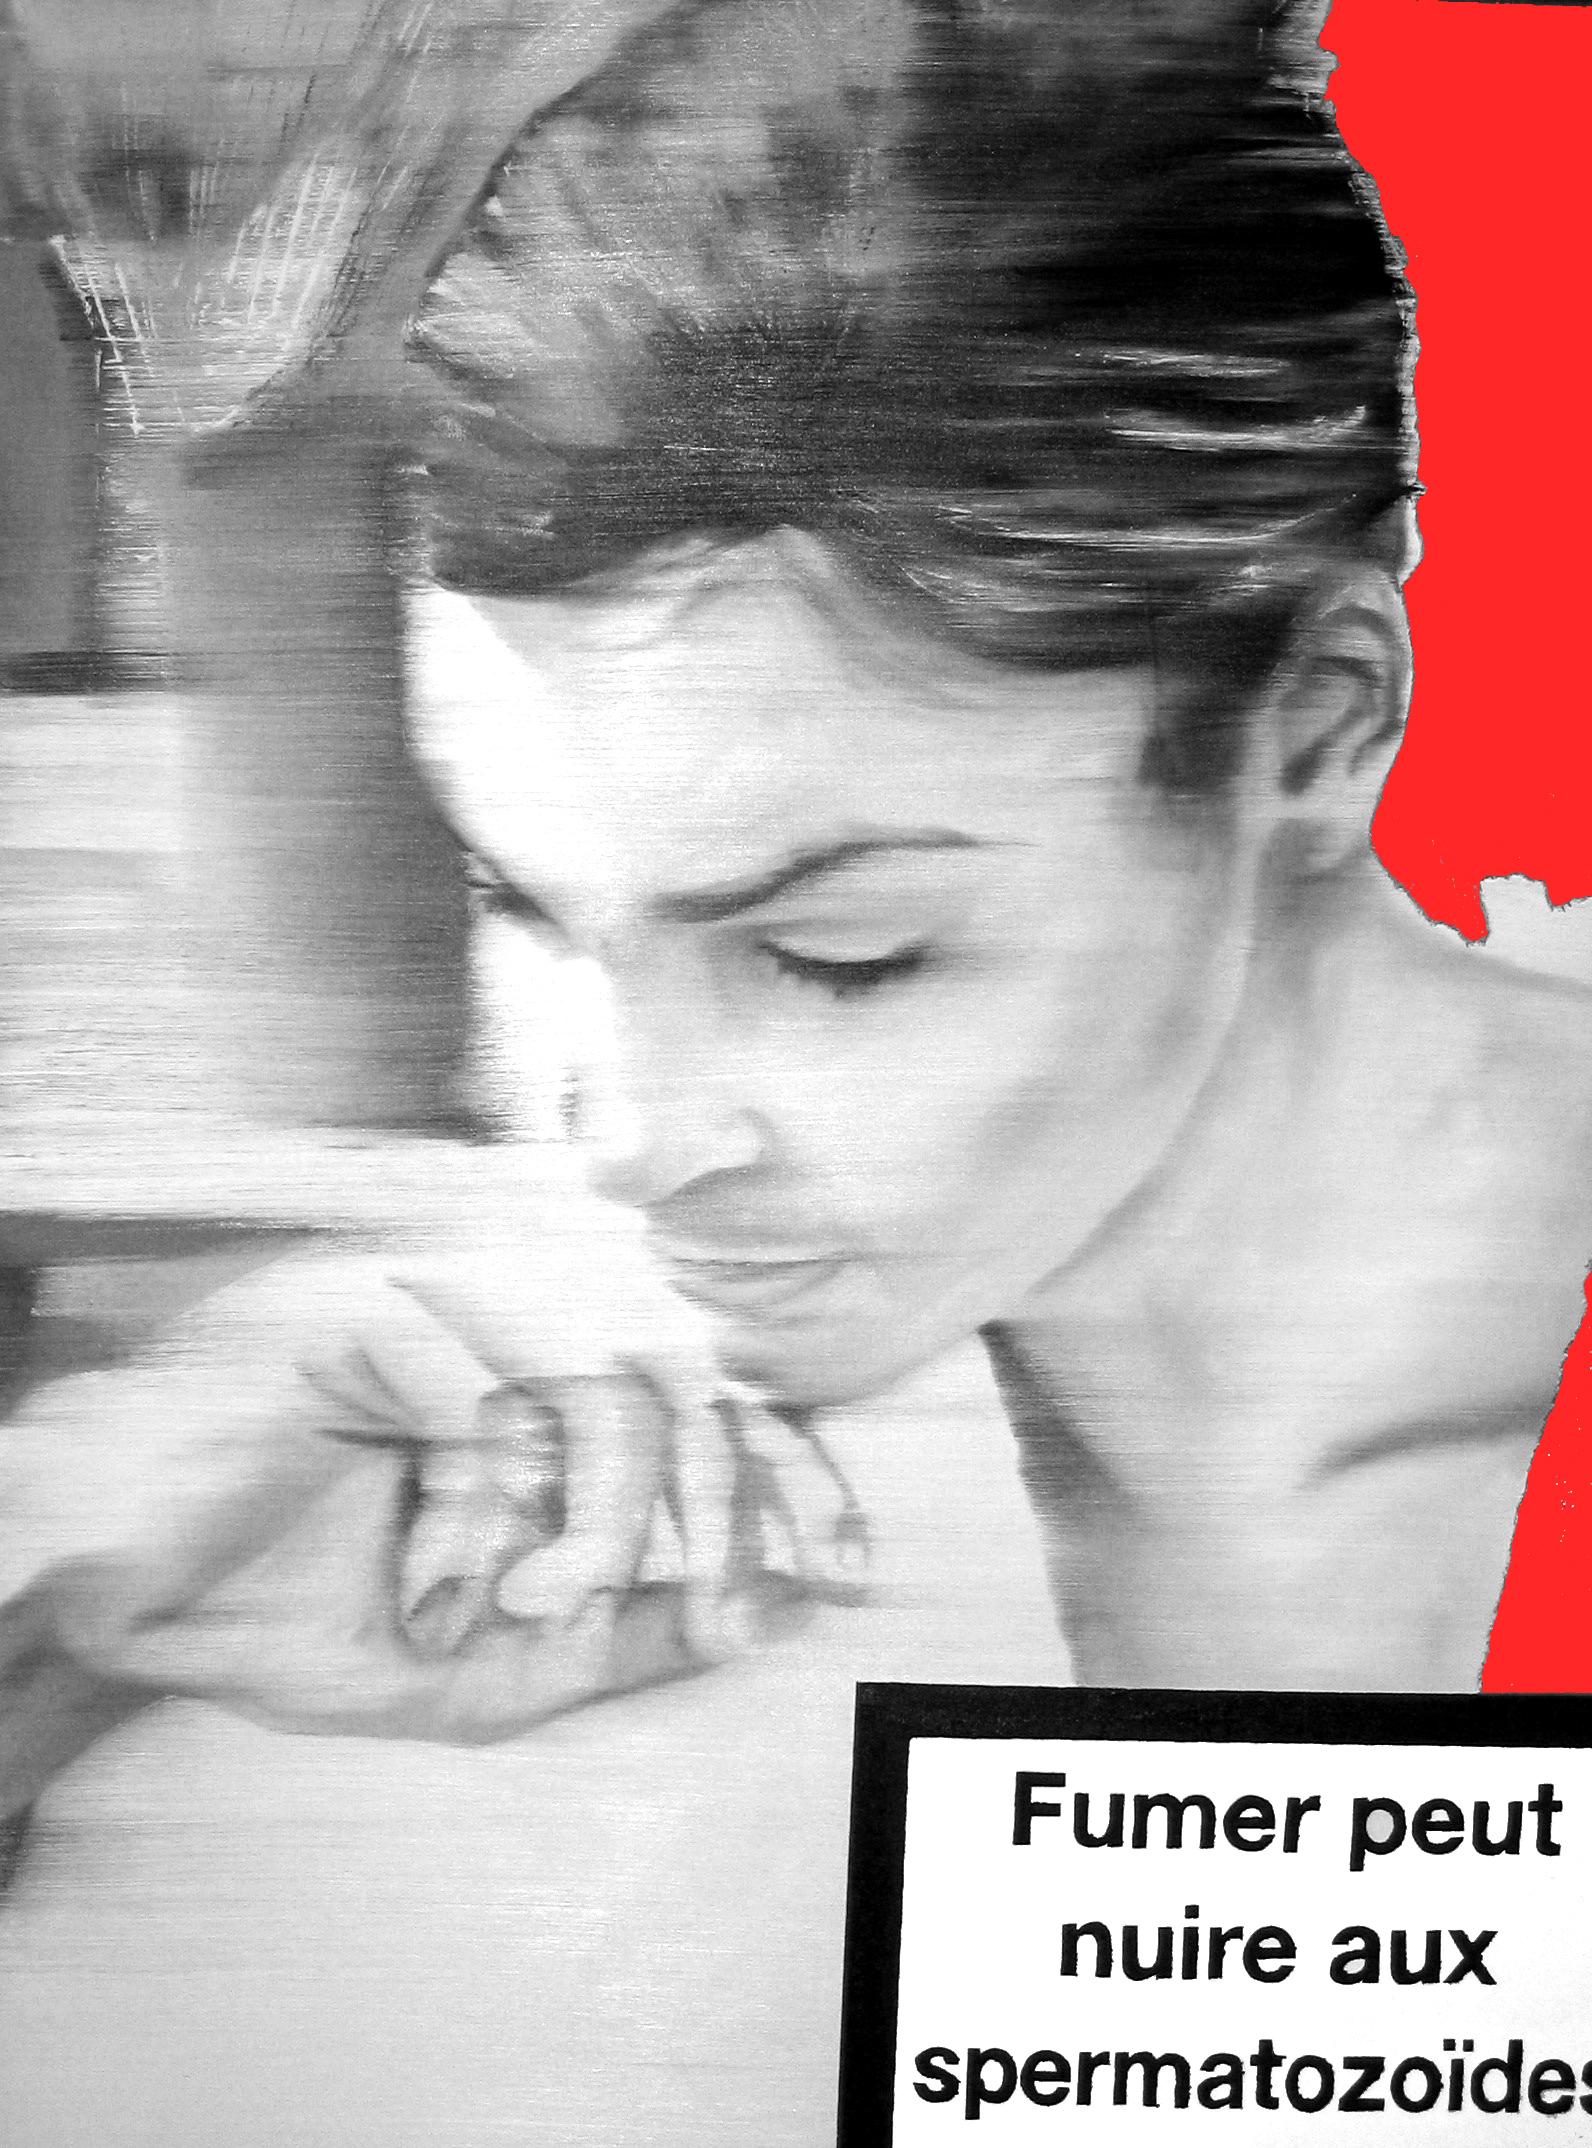 Patrice Palacio - Serie 102 - fumer peut nuire aux spermatozoïdes